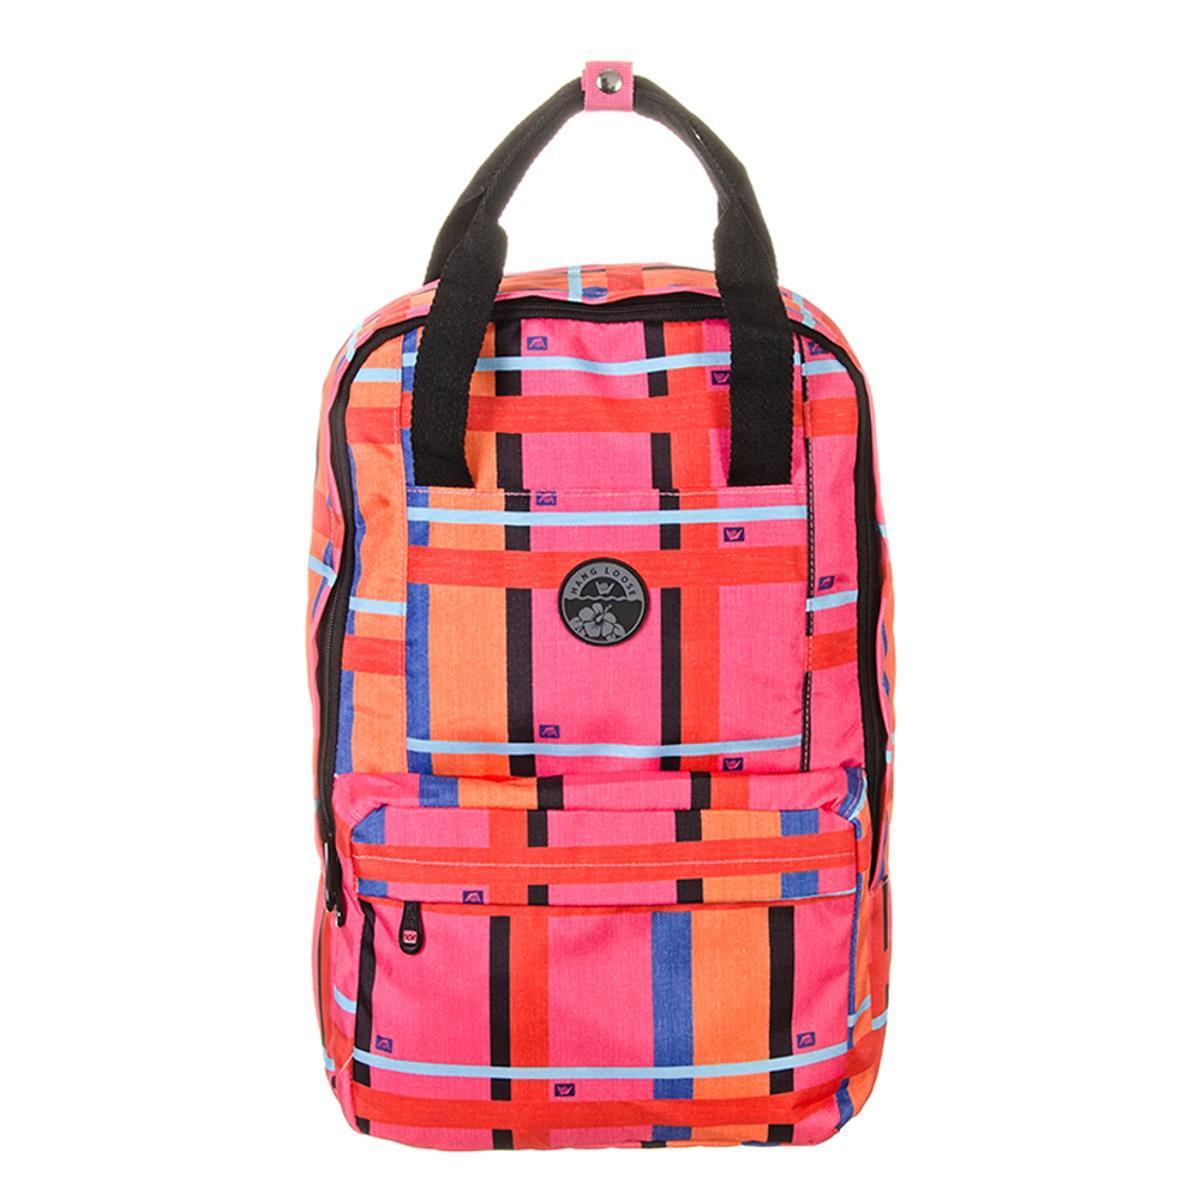 279b5e5cc2248 Mochila Hang Loose Check Girl Pink Laranja - Rosa Escuro e Laranja - Compre  Agora